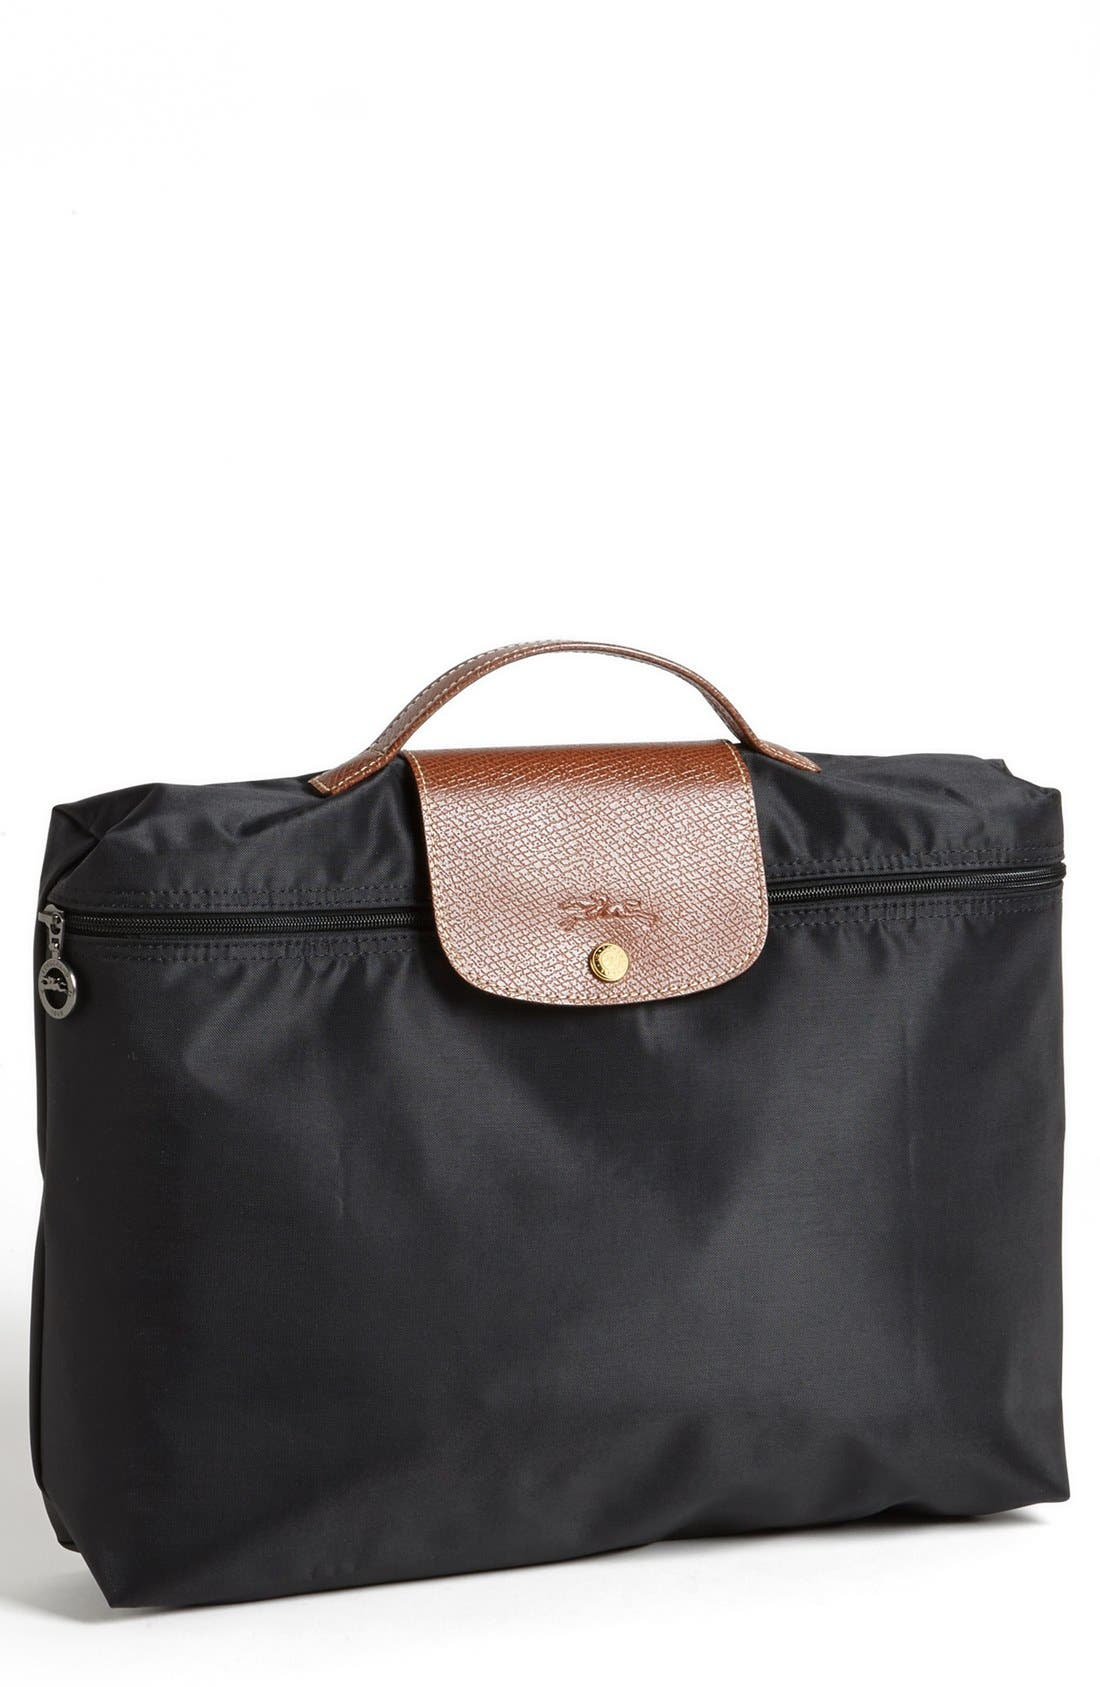 Alternate Image 1 Selected - Longchamp 'Le Pliage' Briefcase